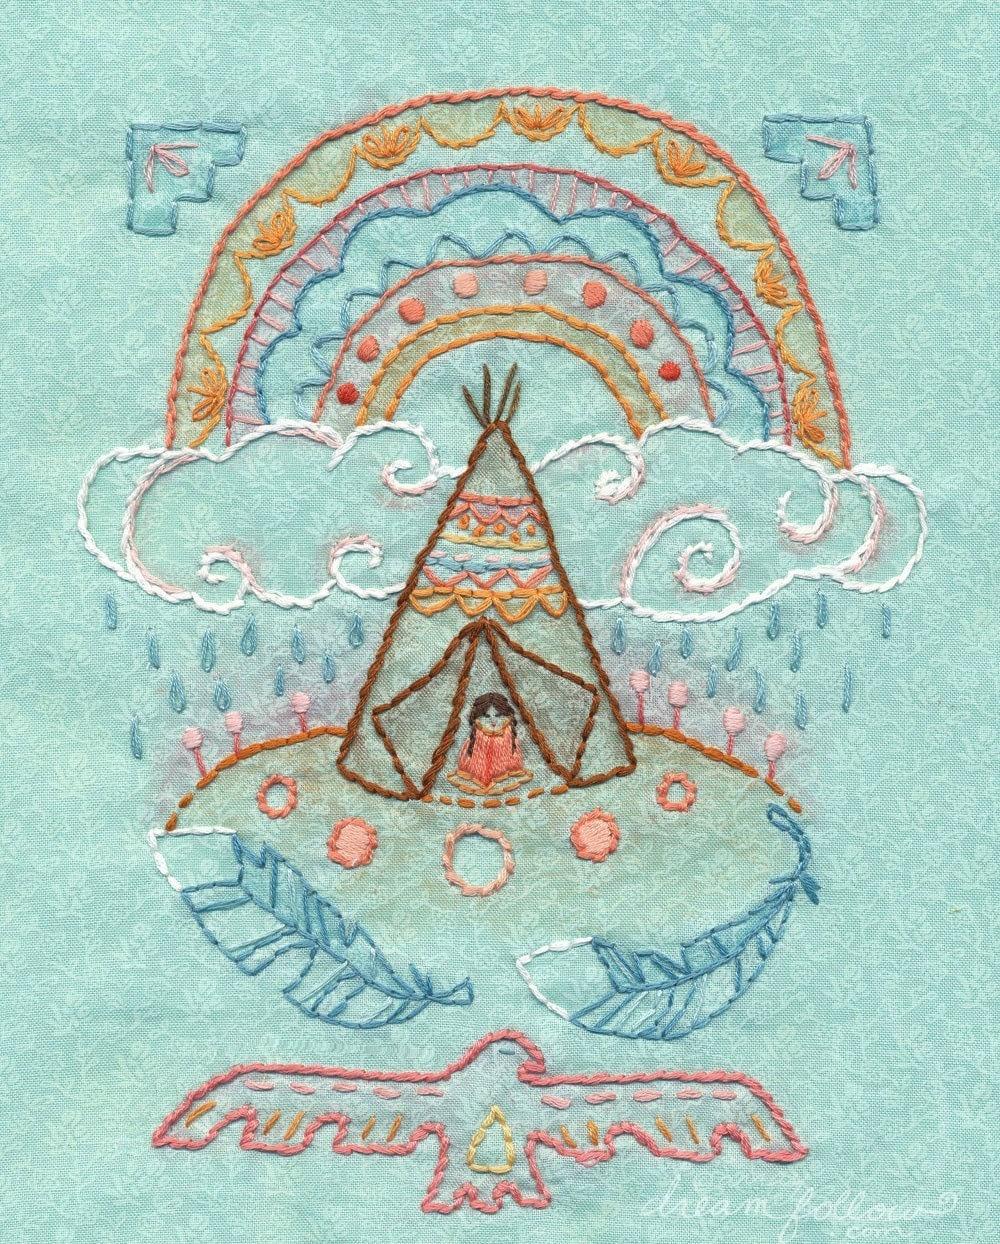 Rainbow warrior embroidery pattern boho decor pdf download